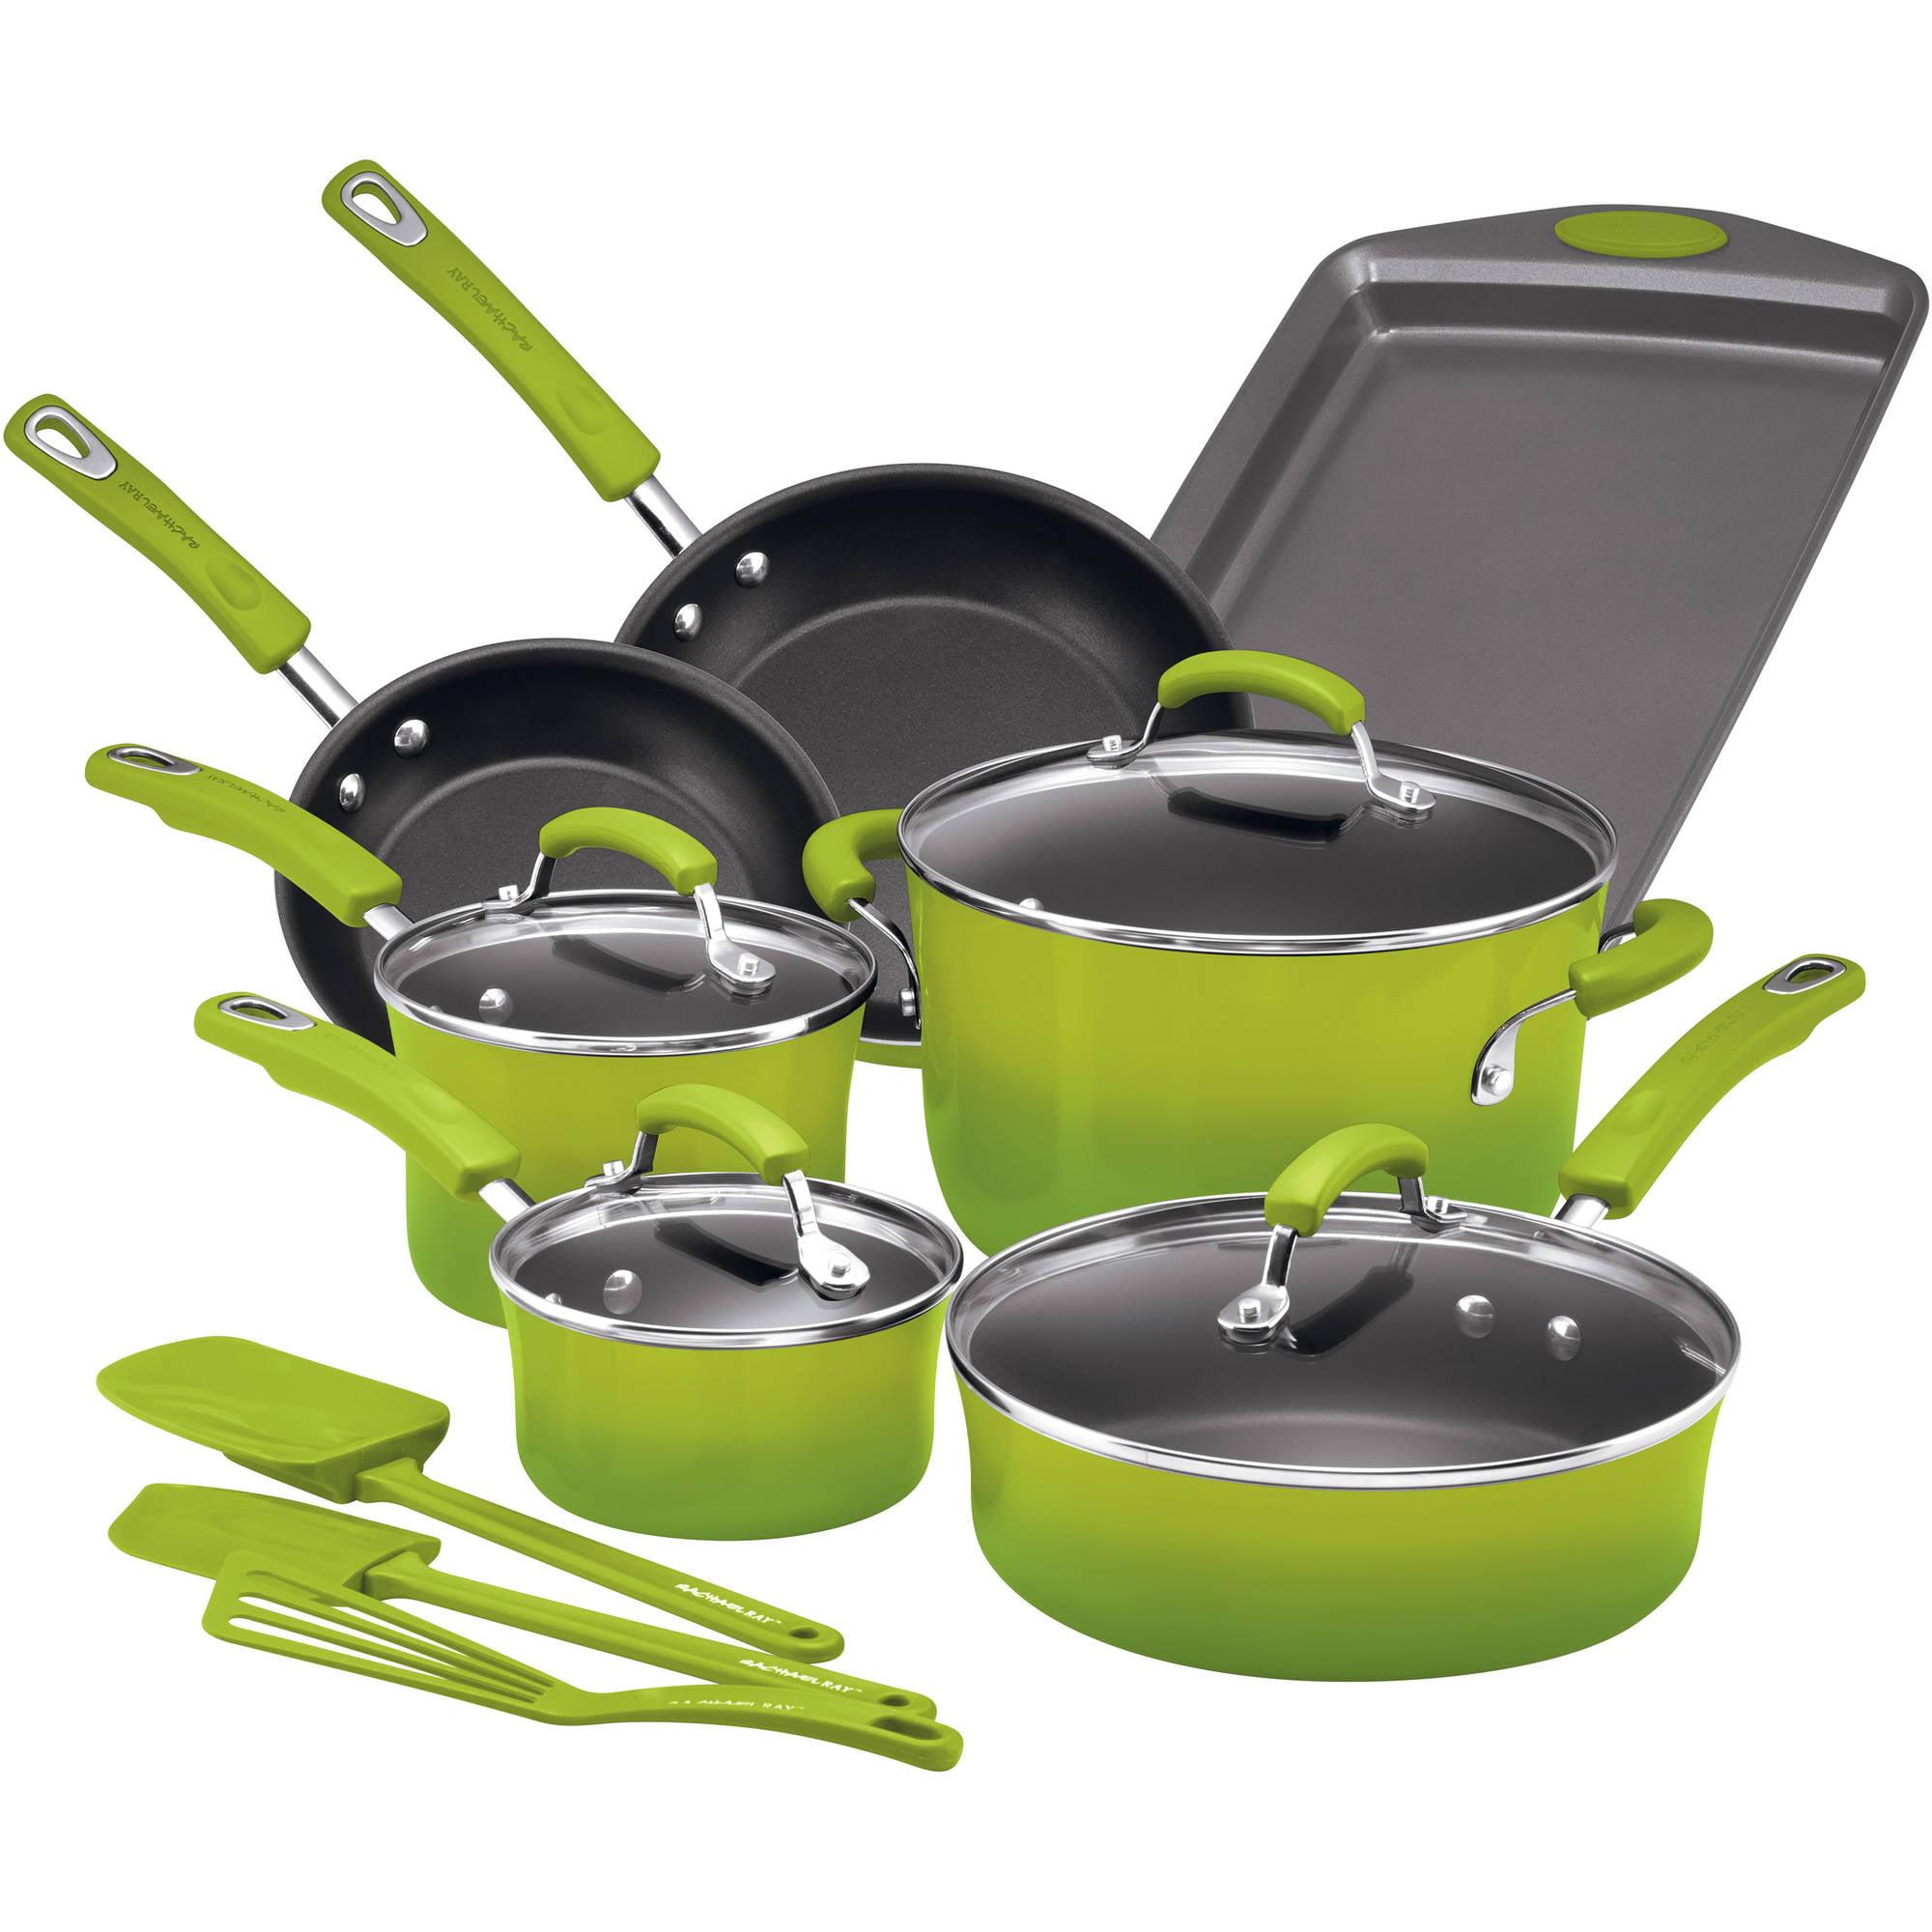 Rachael Ray Hard Enamel Nonstick 14-Piece Cookware Set, Green Gradient by Meyer Corporation